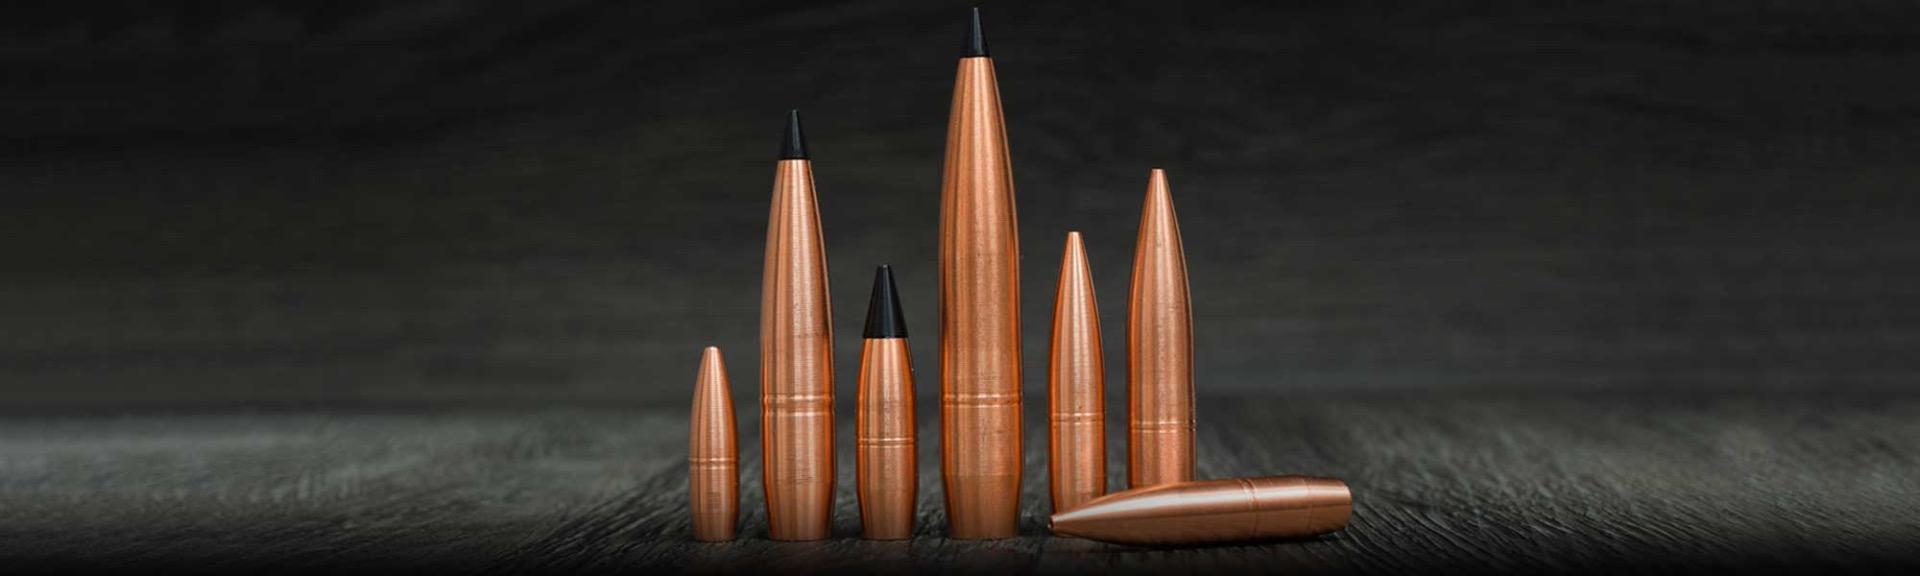 bullets-cutting-edge-